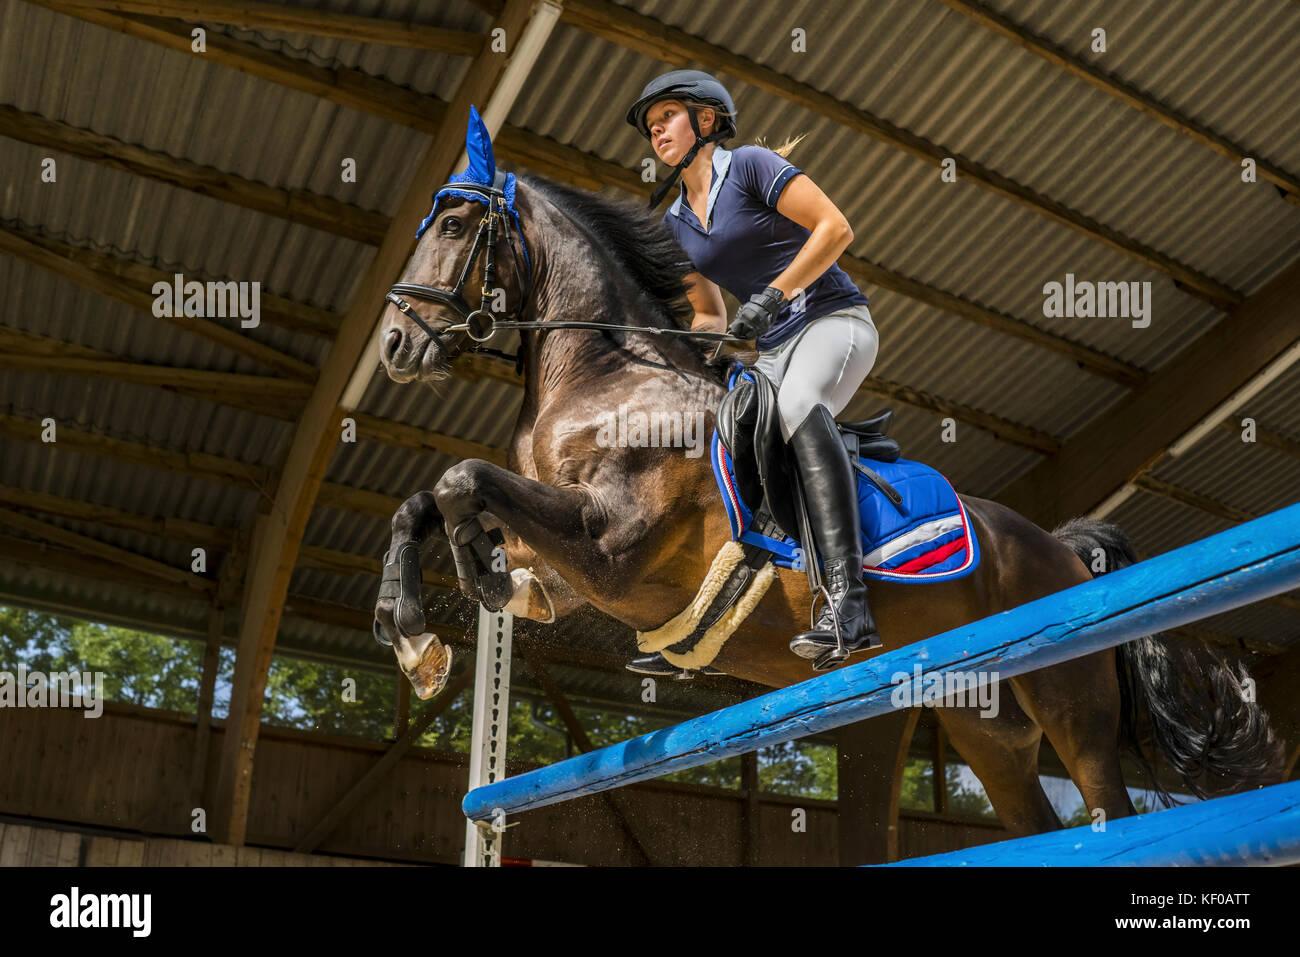 Junge Frau auf Pferd Kreuzung Hindernis auf Kurs Stockbild